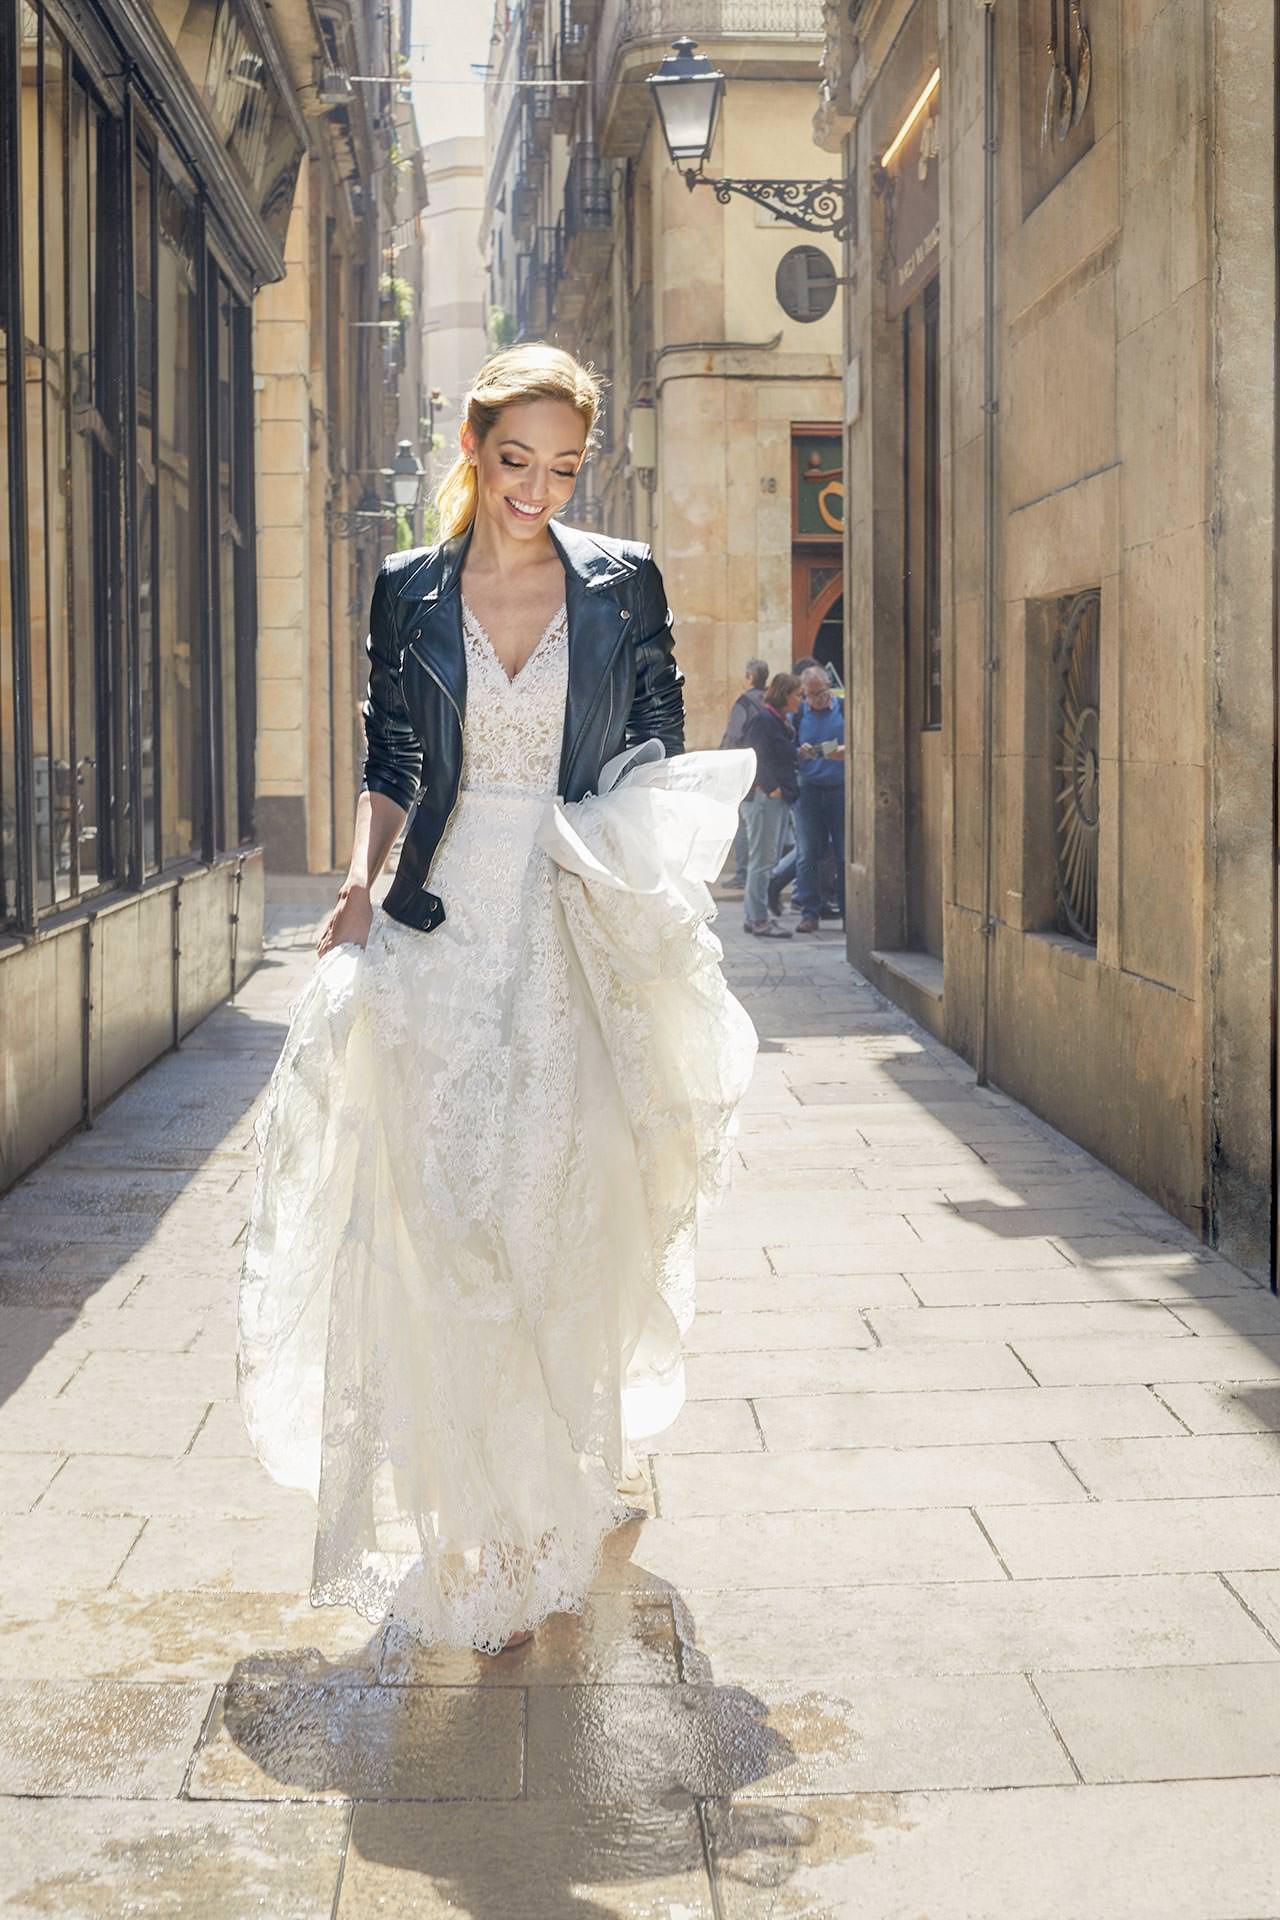 Fashion photographer Marc Díez shooting Pronovias wedding dresses